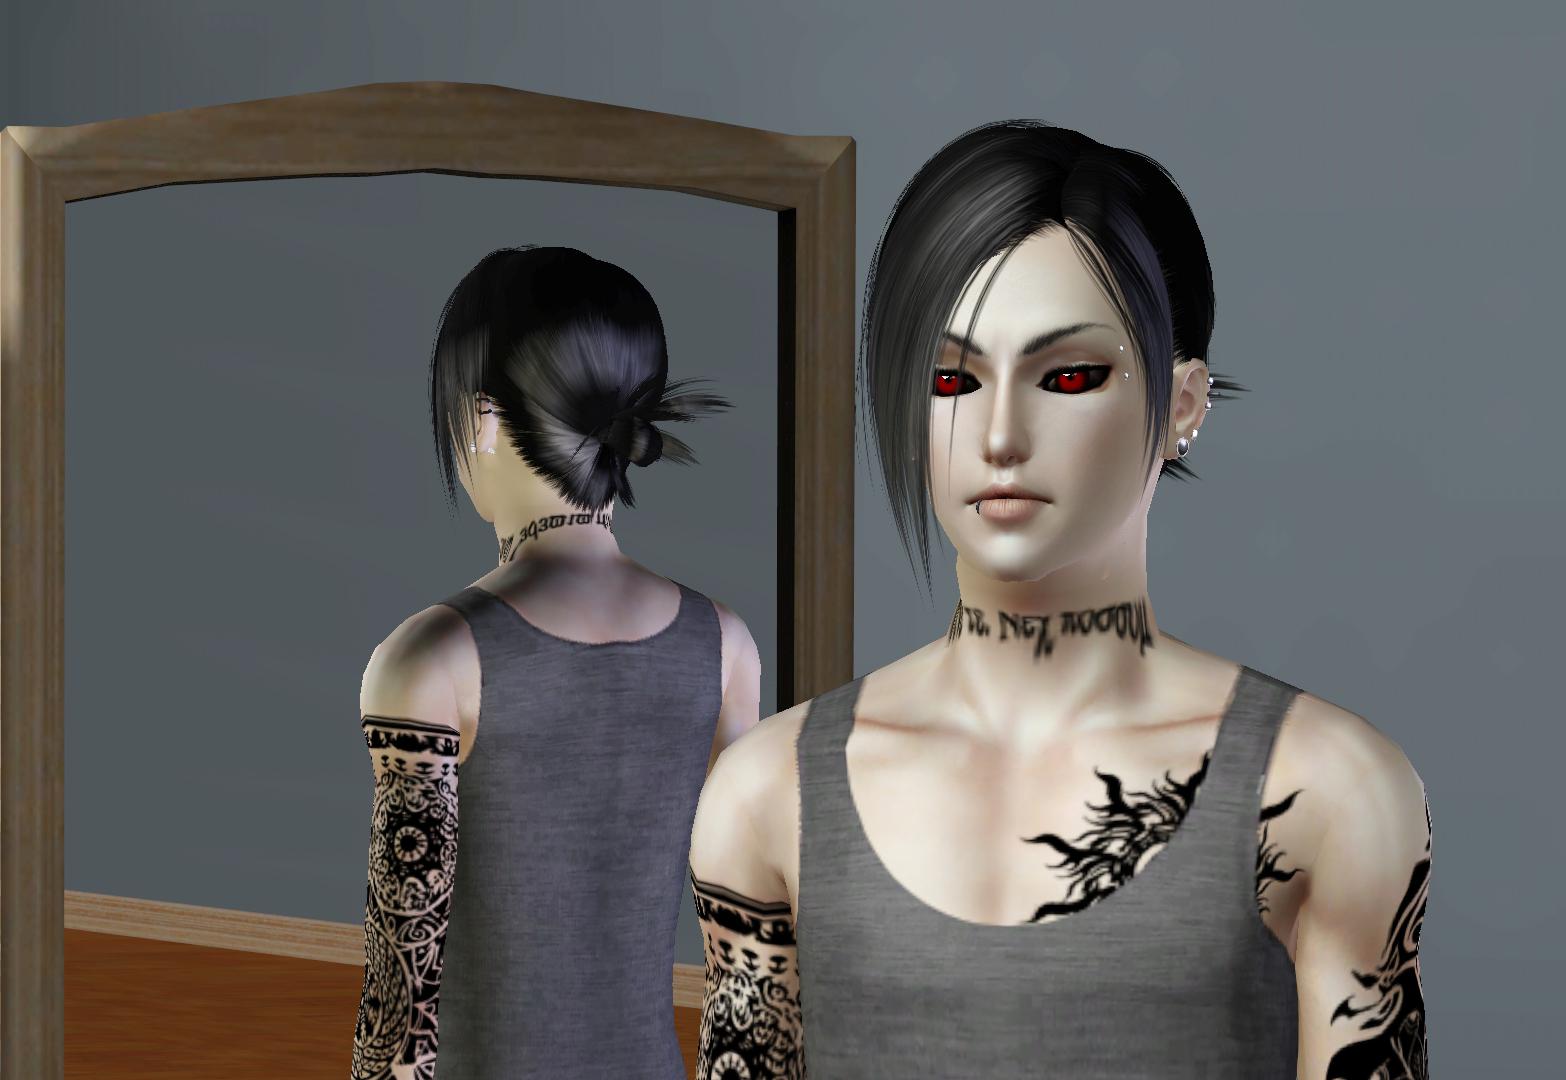 Sims 3 Anime Characters : Ng sims uta ken kaneki tokyo ghoul anime